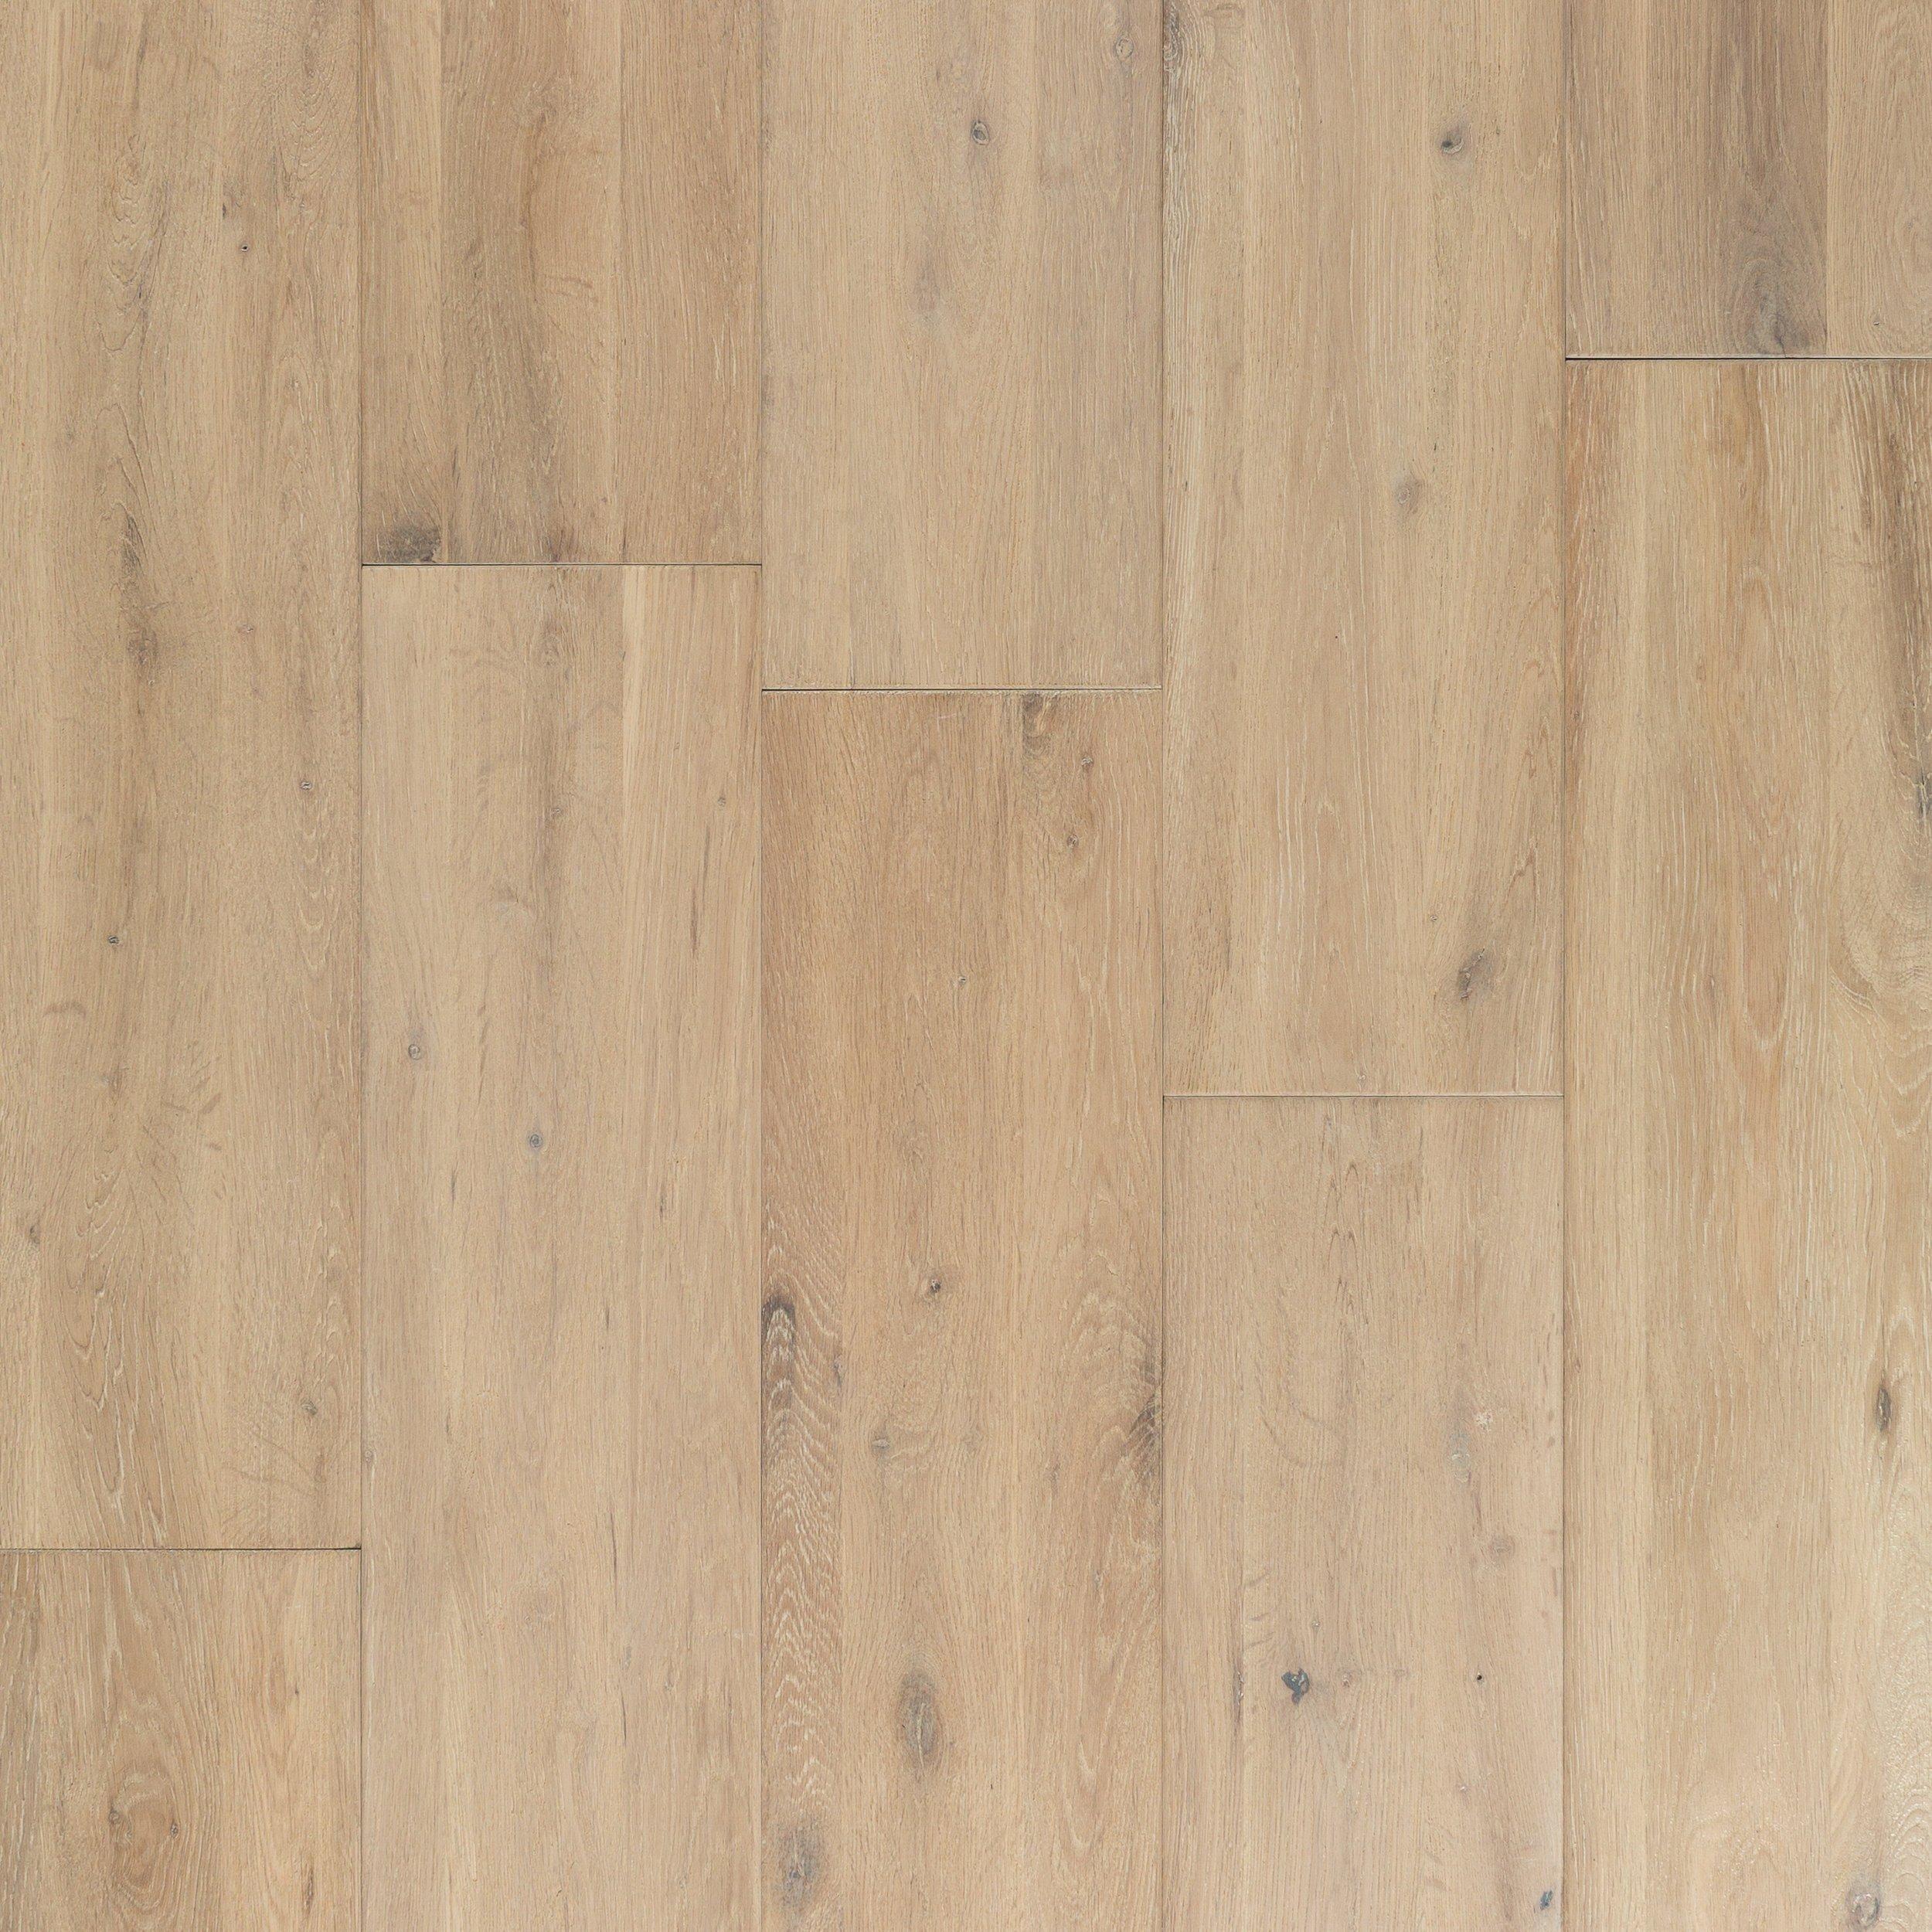 Light Gray Oak Wire Brushed Solid Hardwood Light Oak Floors